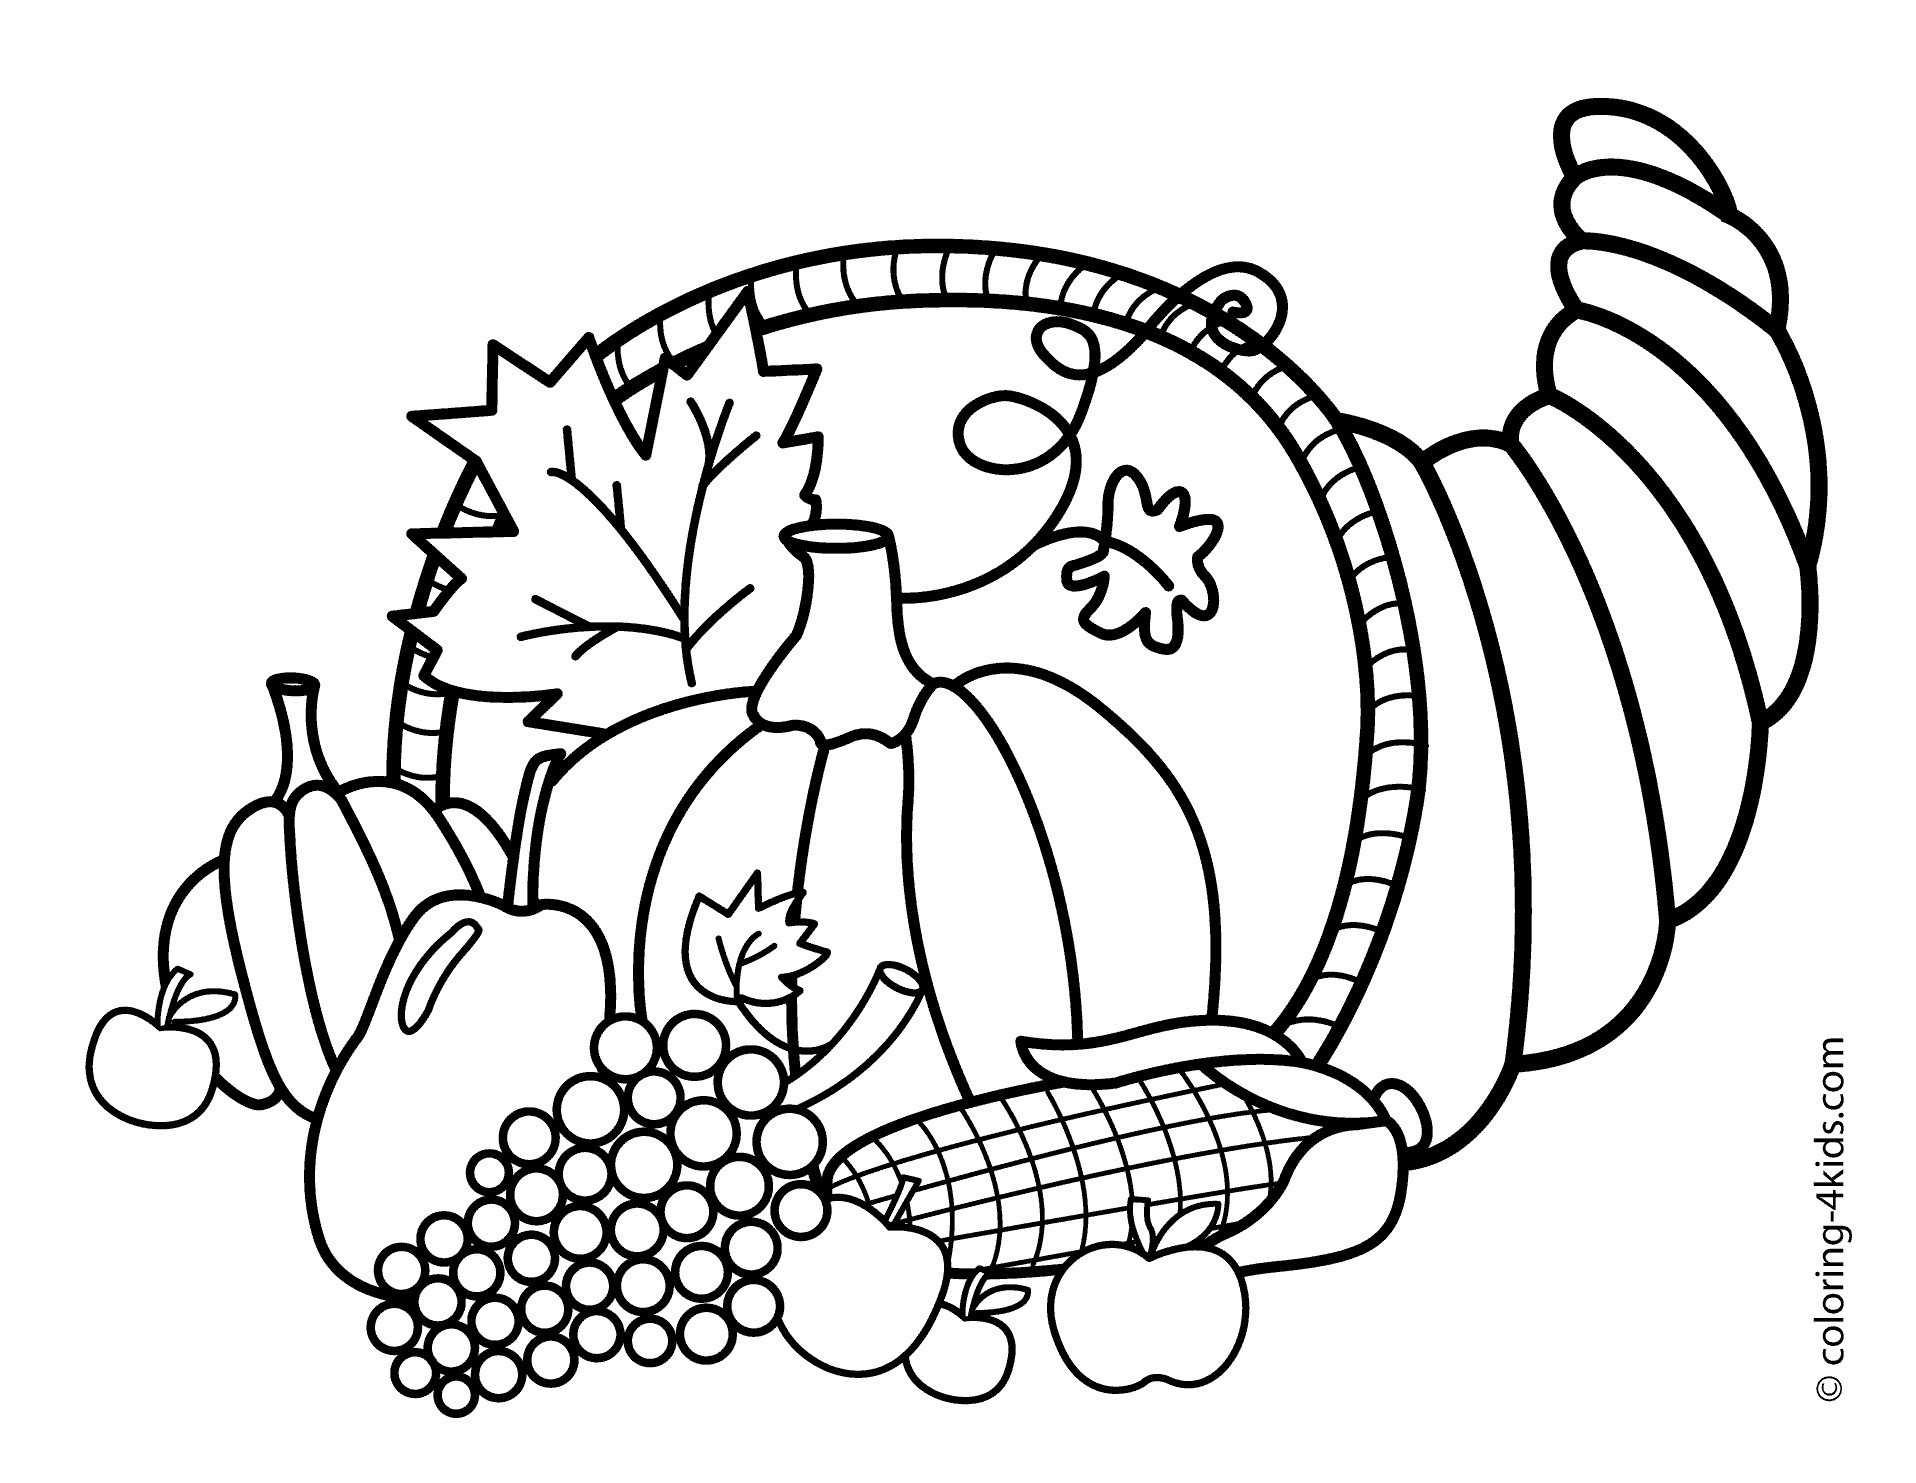 Bakugan Coloring Pages - Dddmen - Printable Bakugan Coloring Pages Free